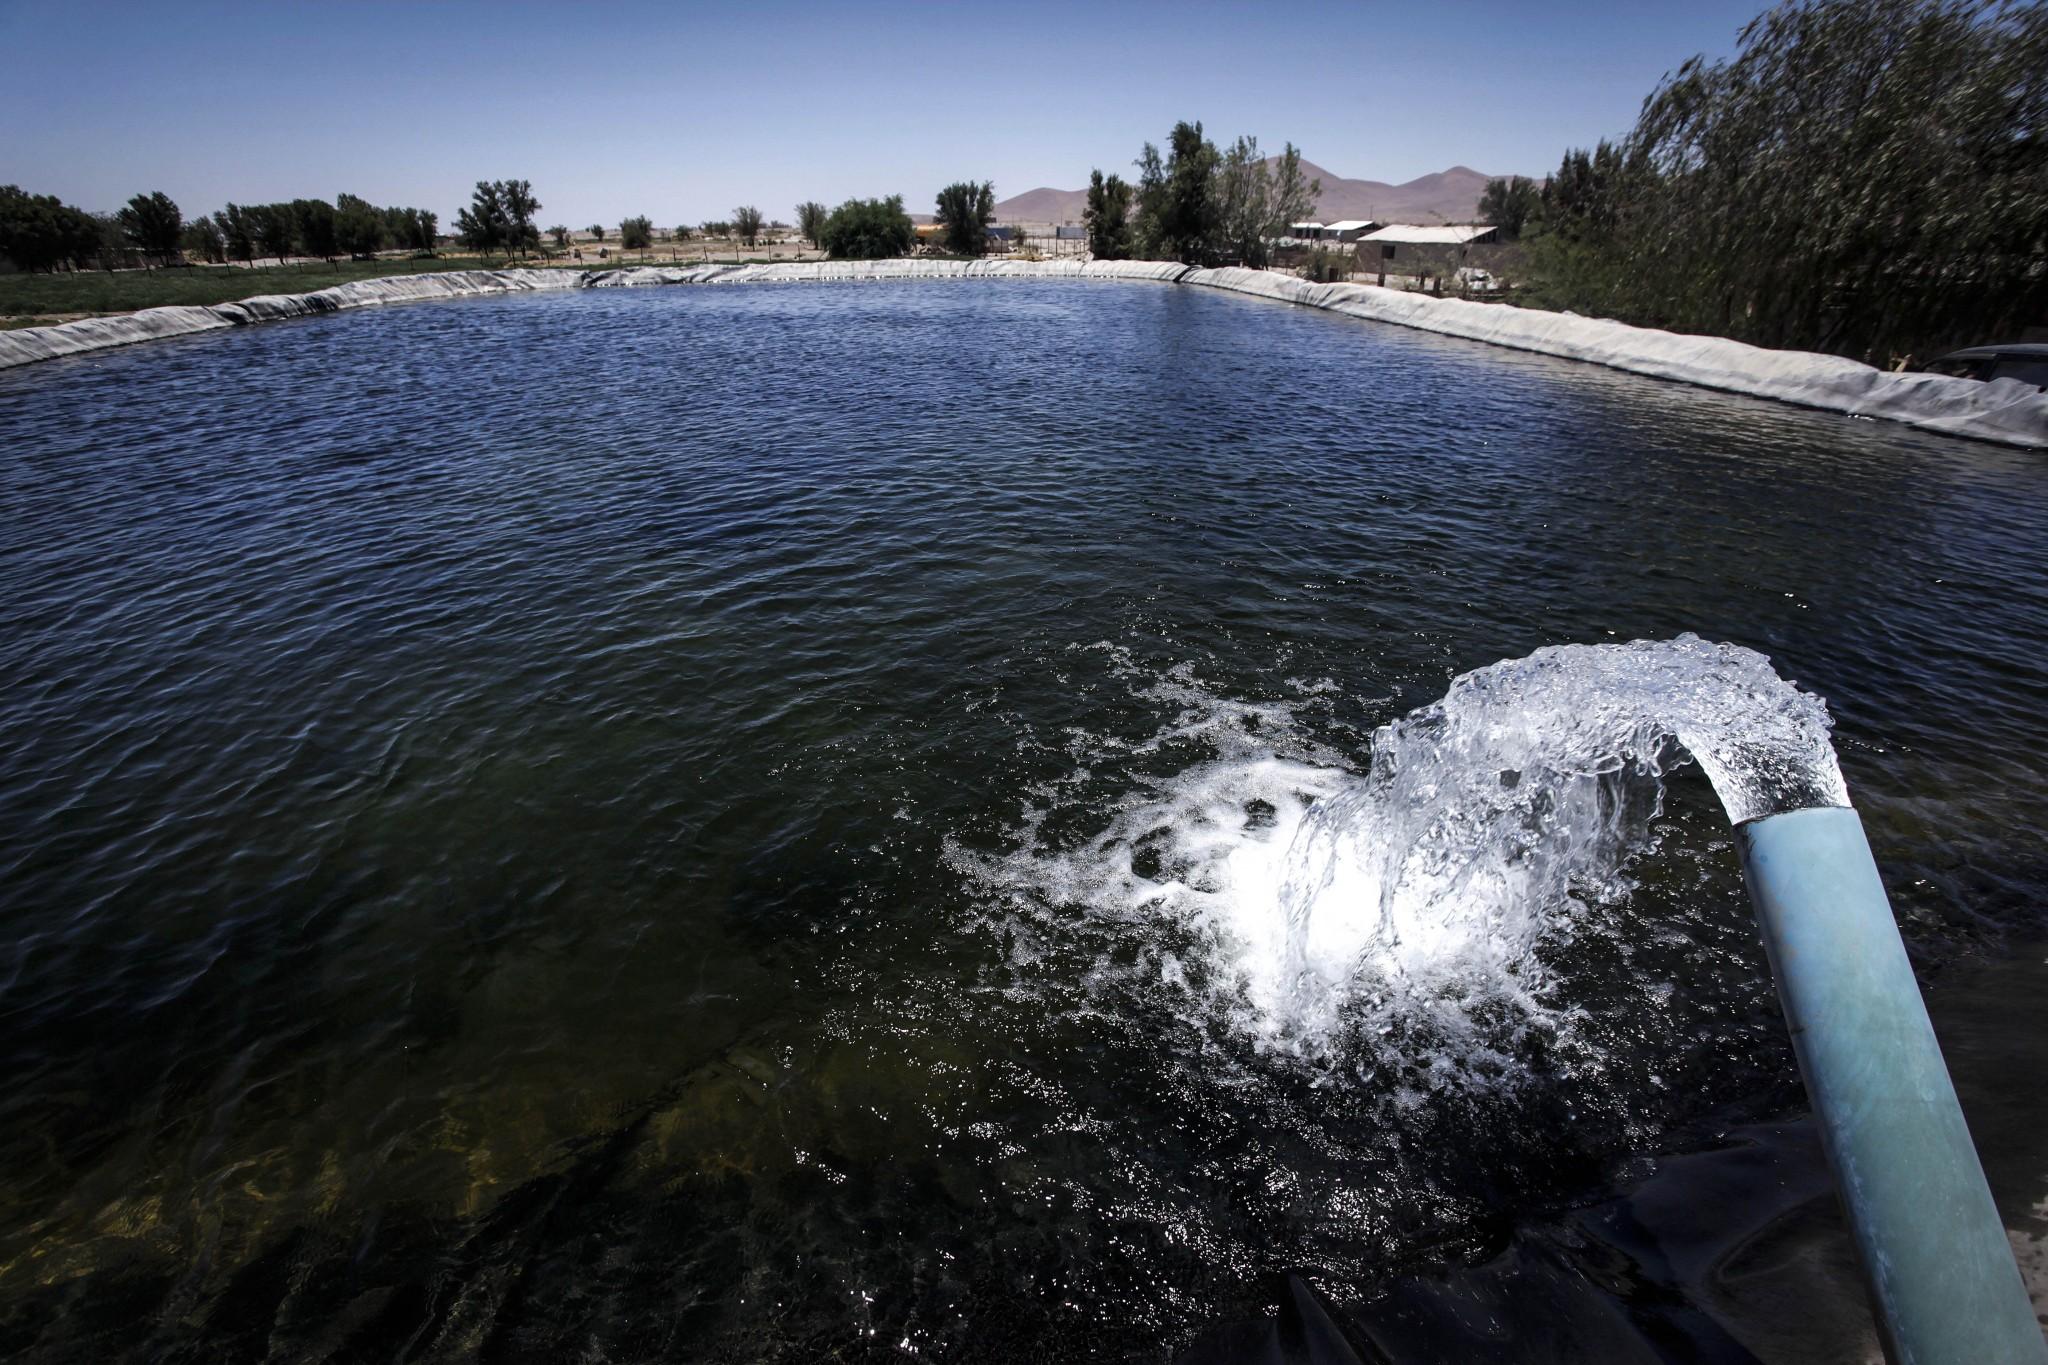 Buscan recuperar aguas residuales para uso agrícola en Pozo Almonte